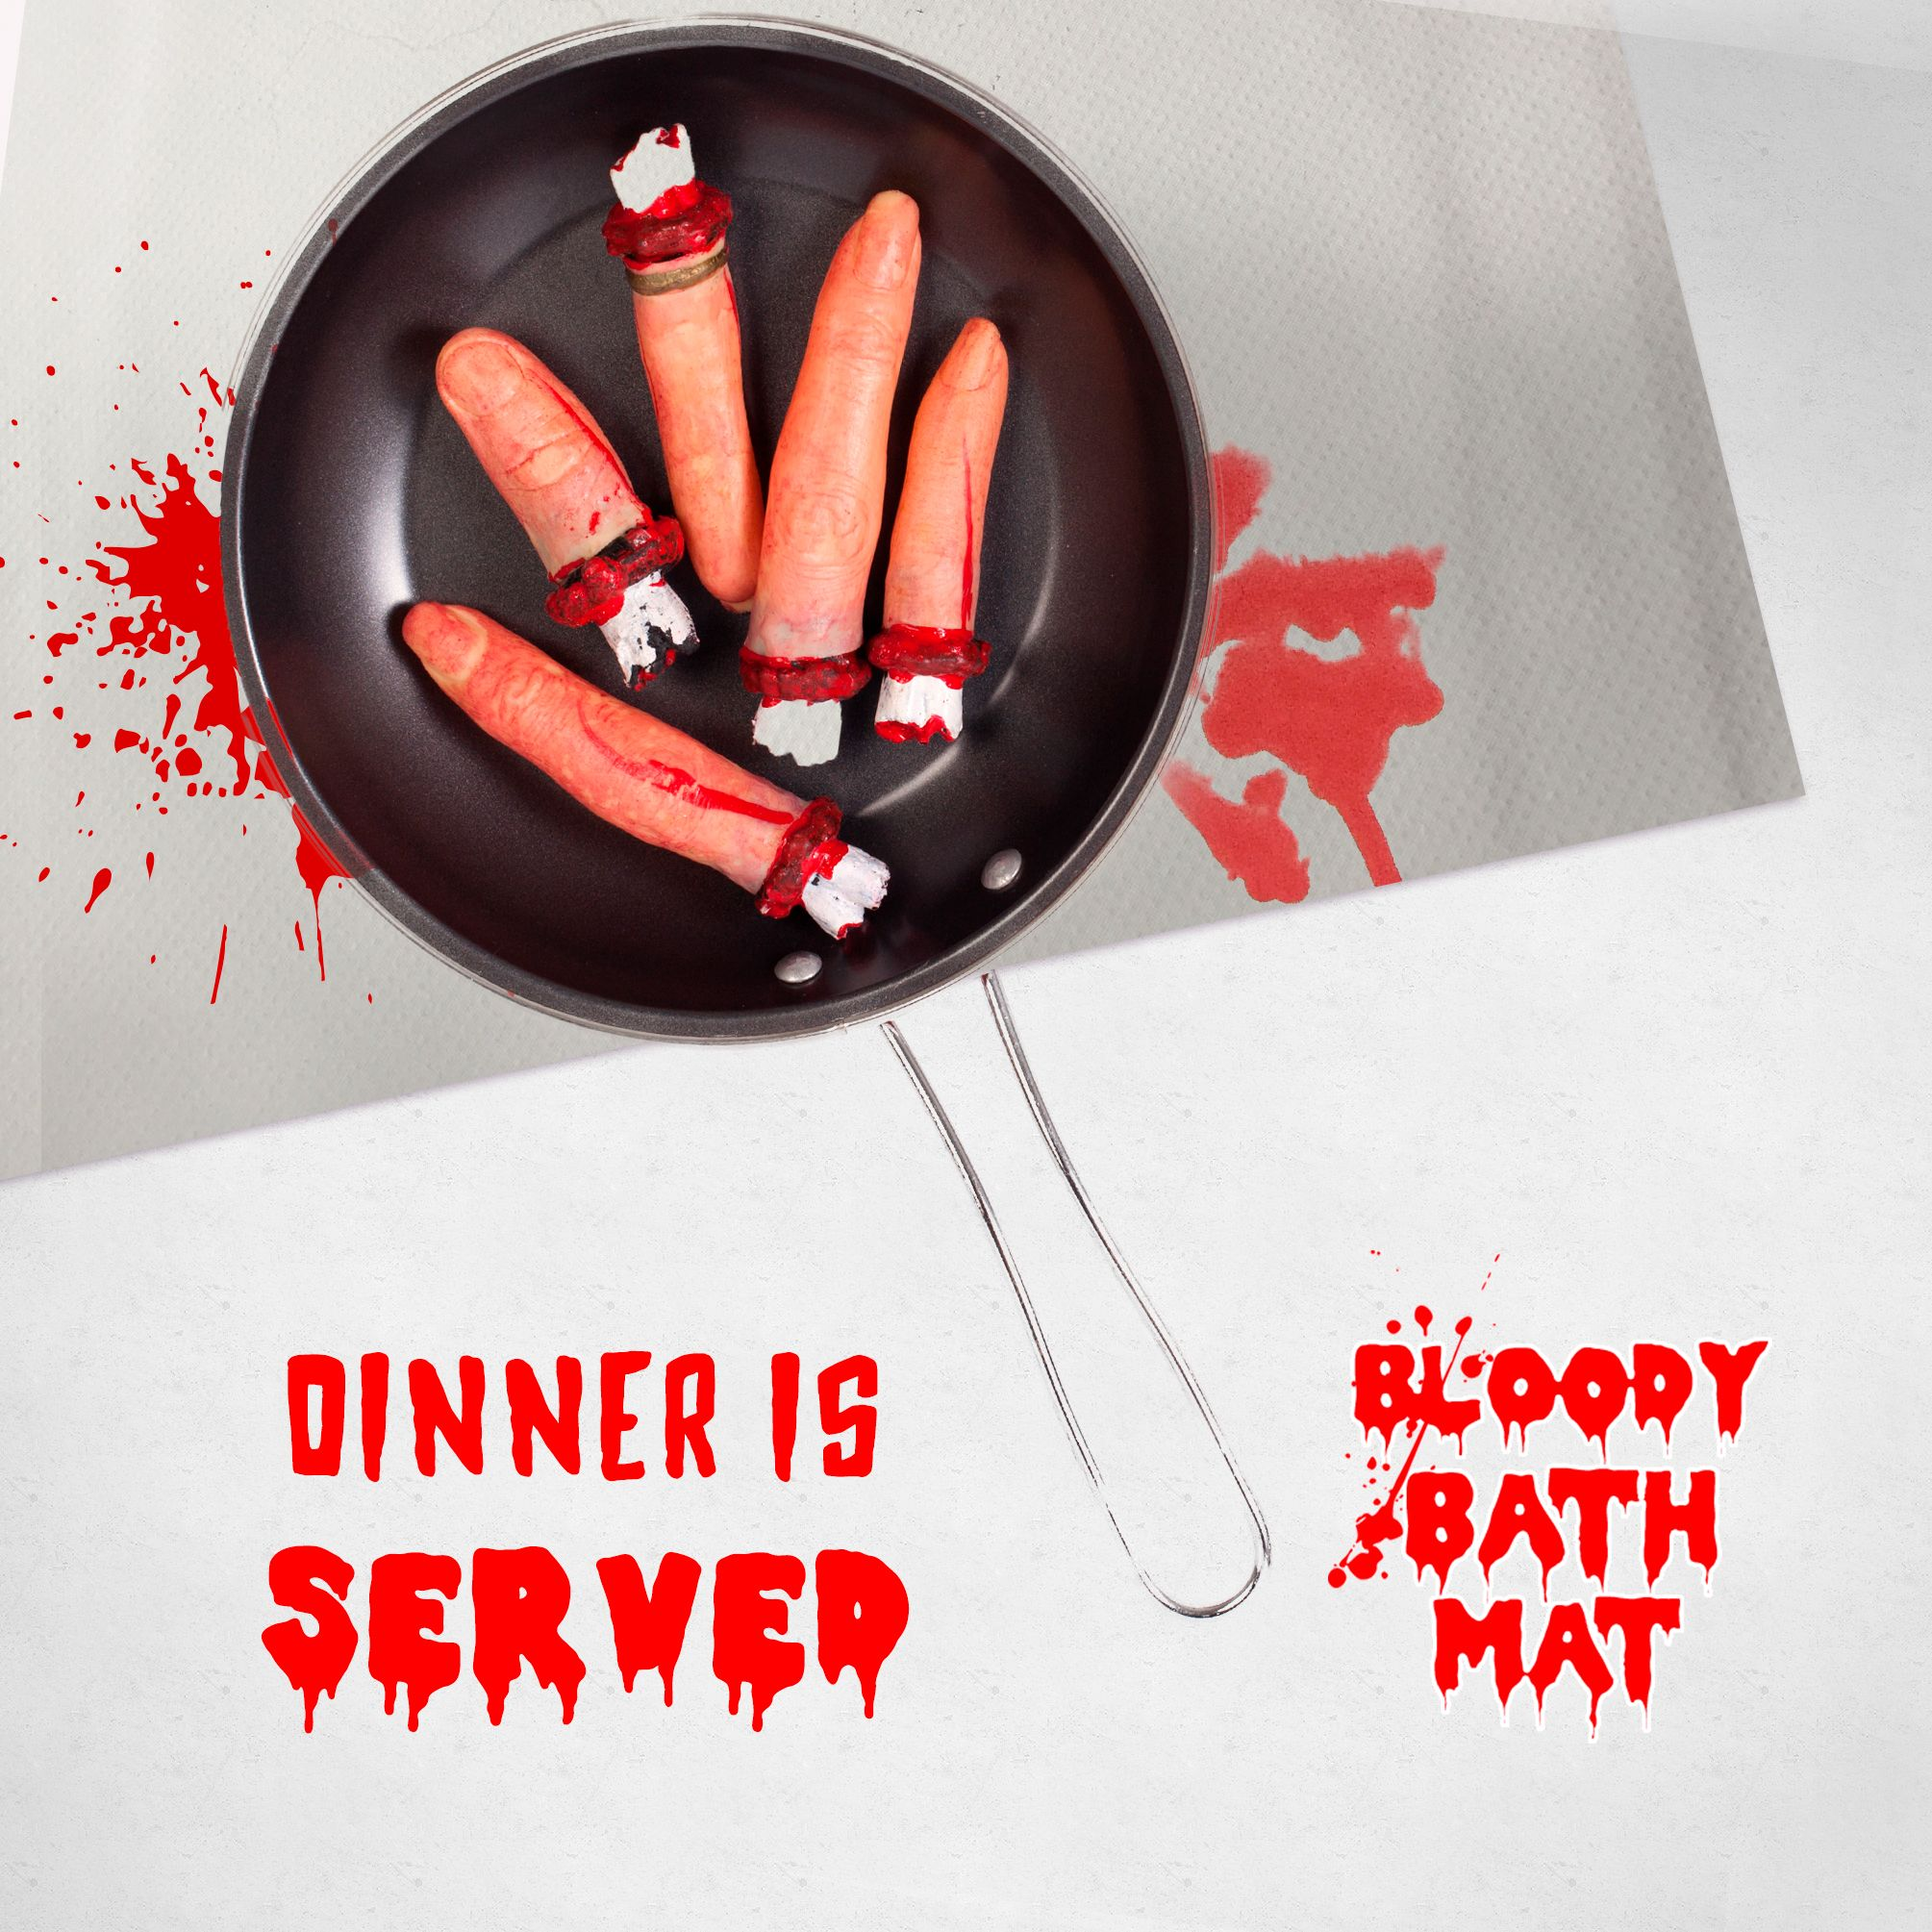 Pin On Bloody Bath Mat